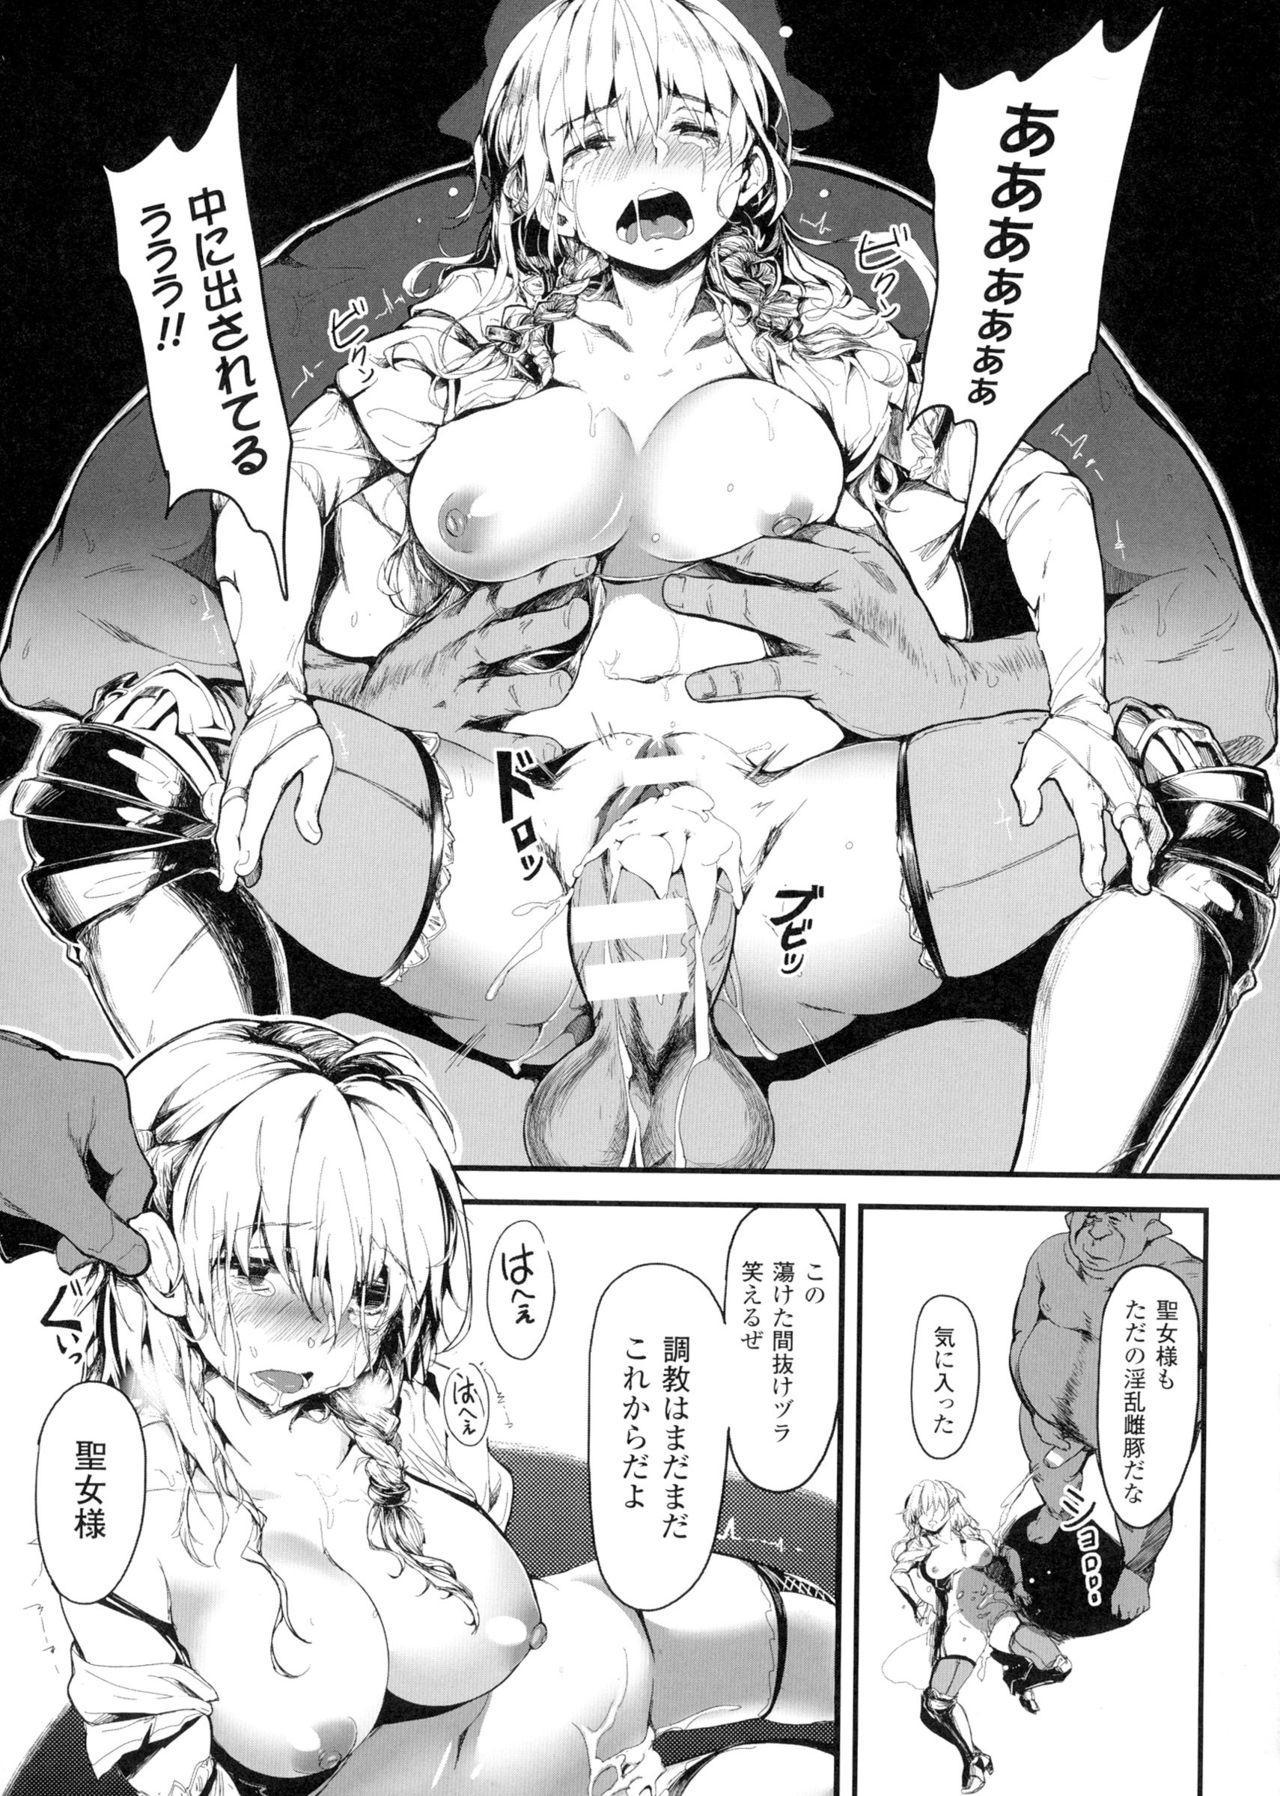 Seigi no Heroine Kangoku File DX Vol. 1 67